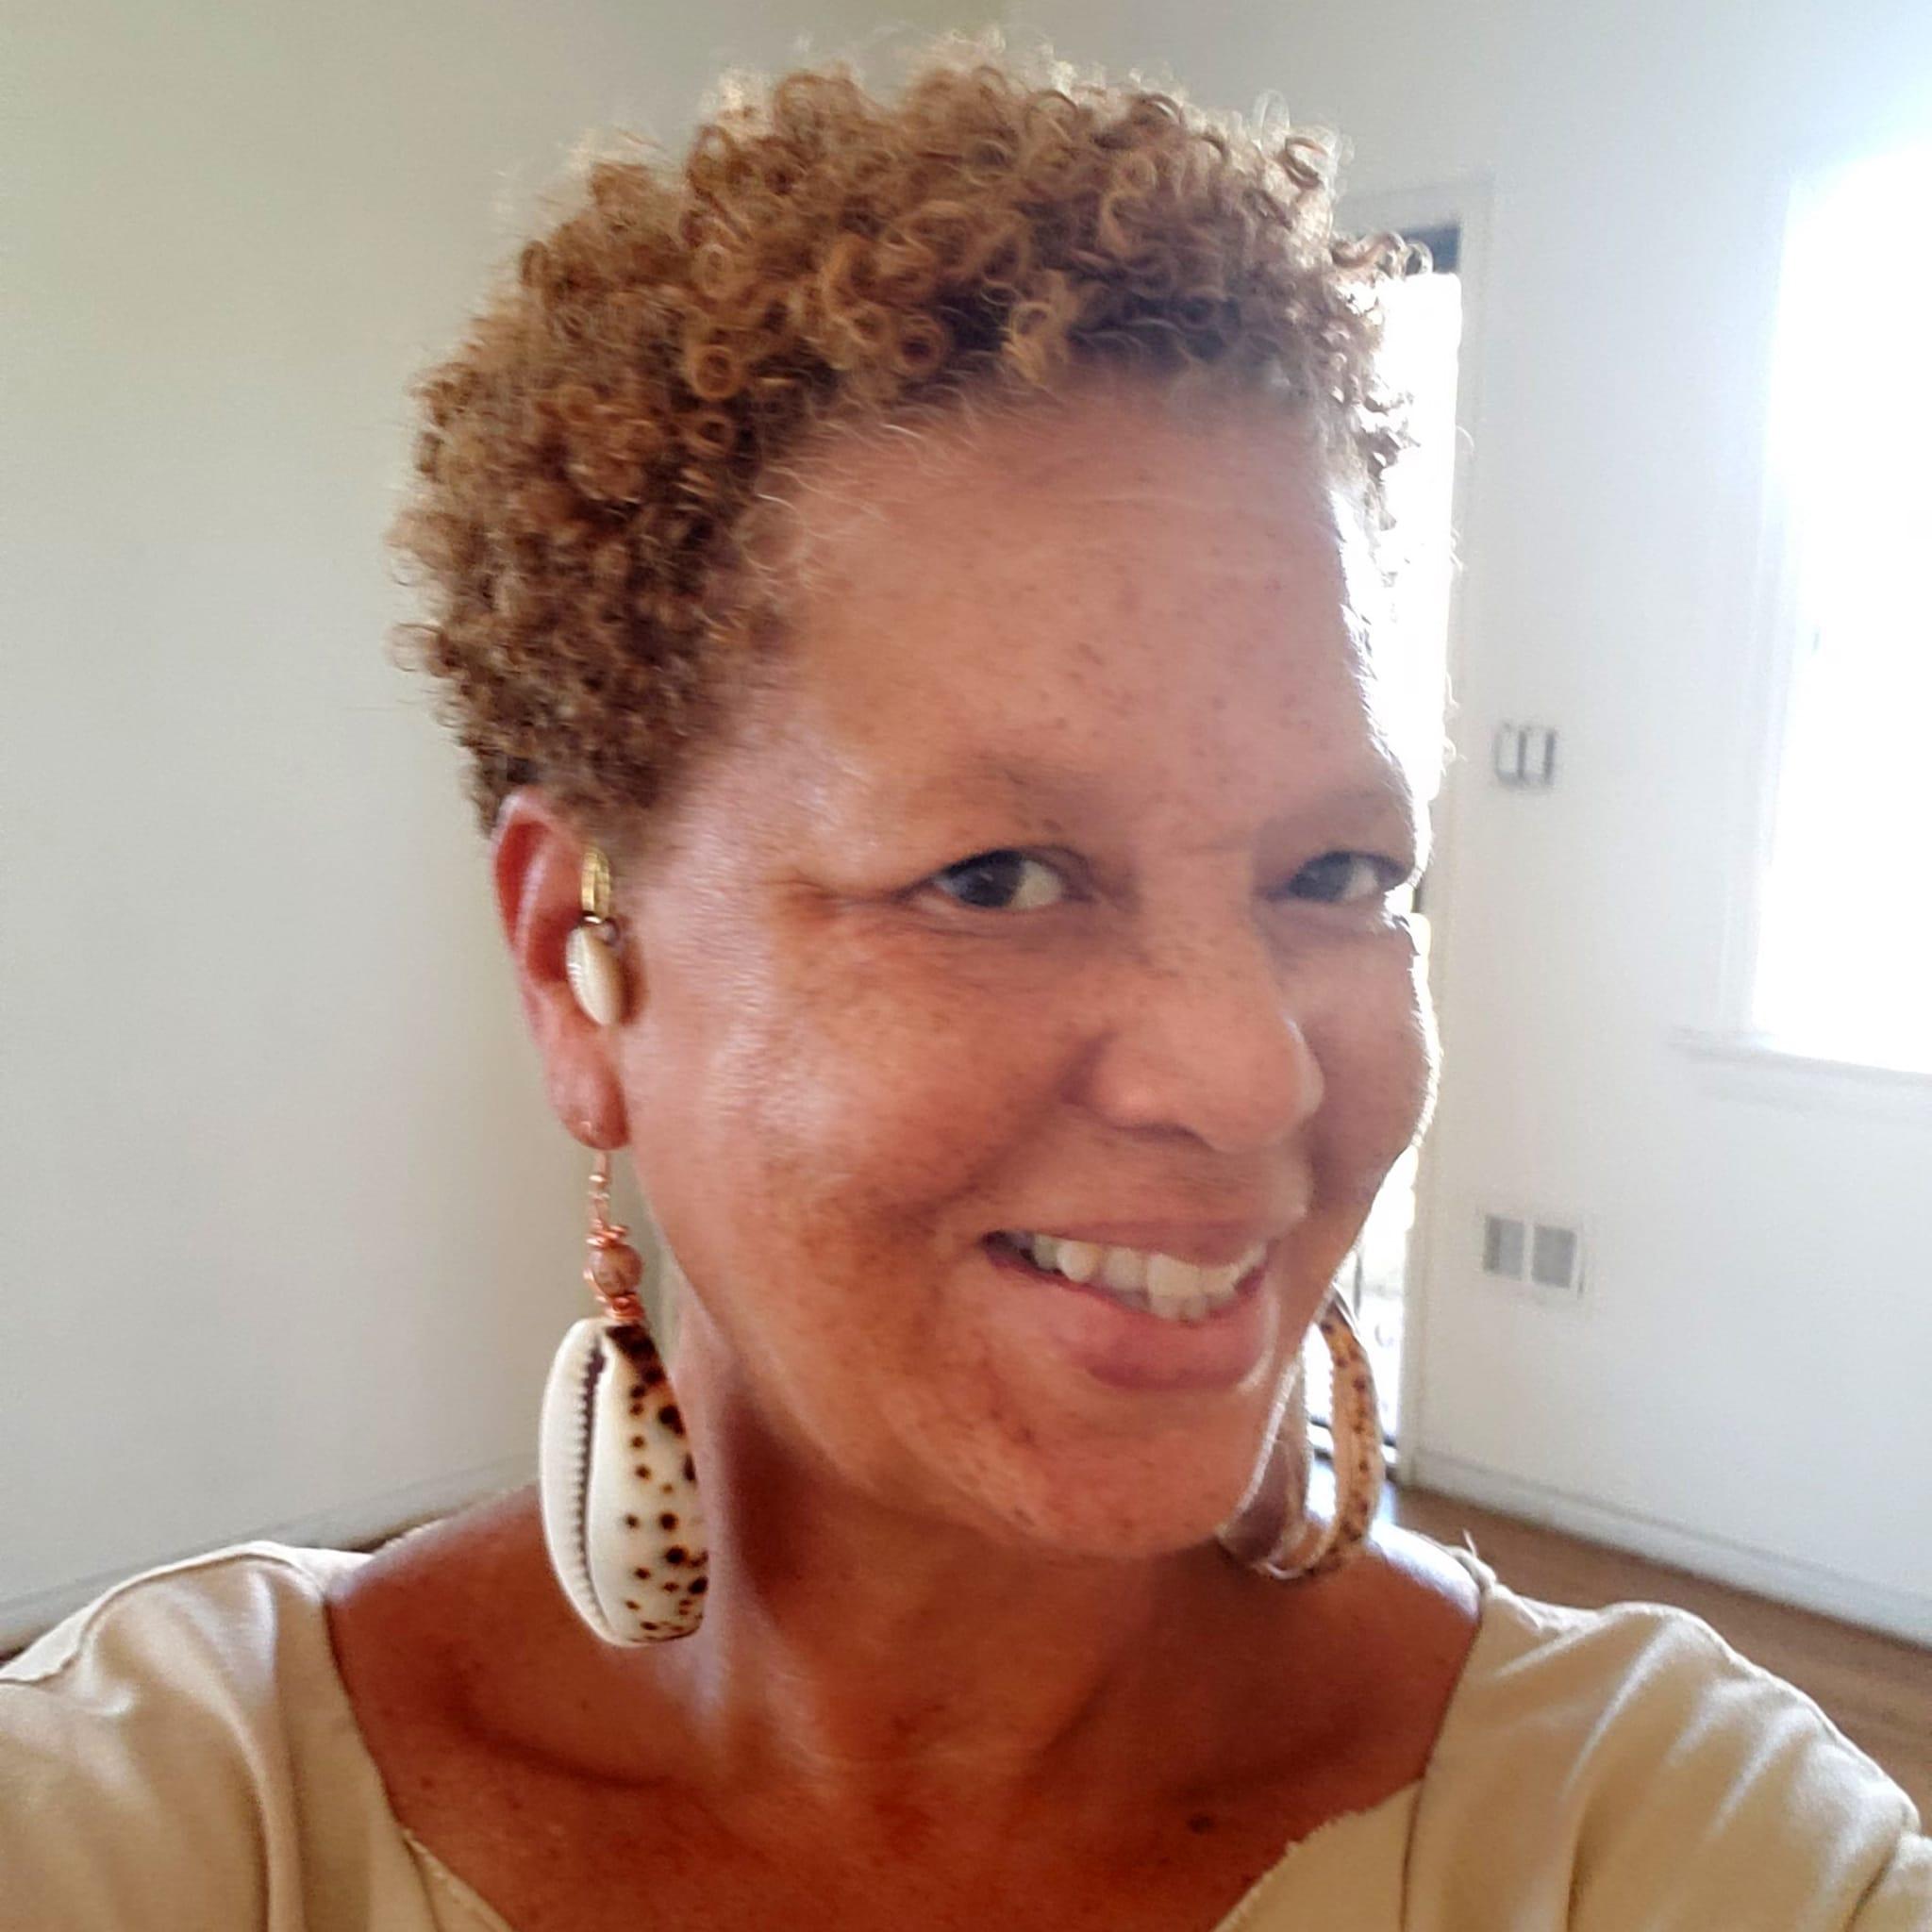 Sandra-Lorraine-Coleman-scaled.jpg